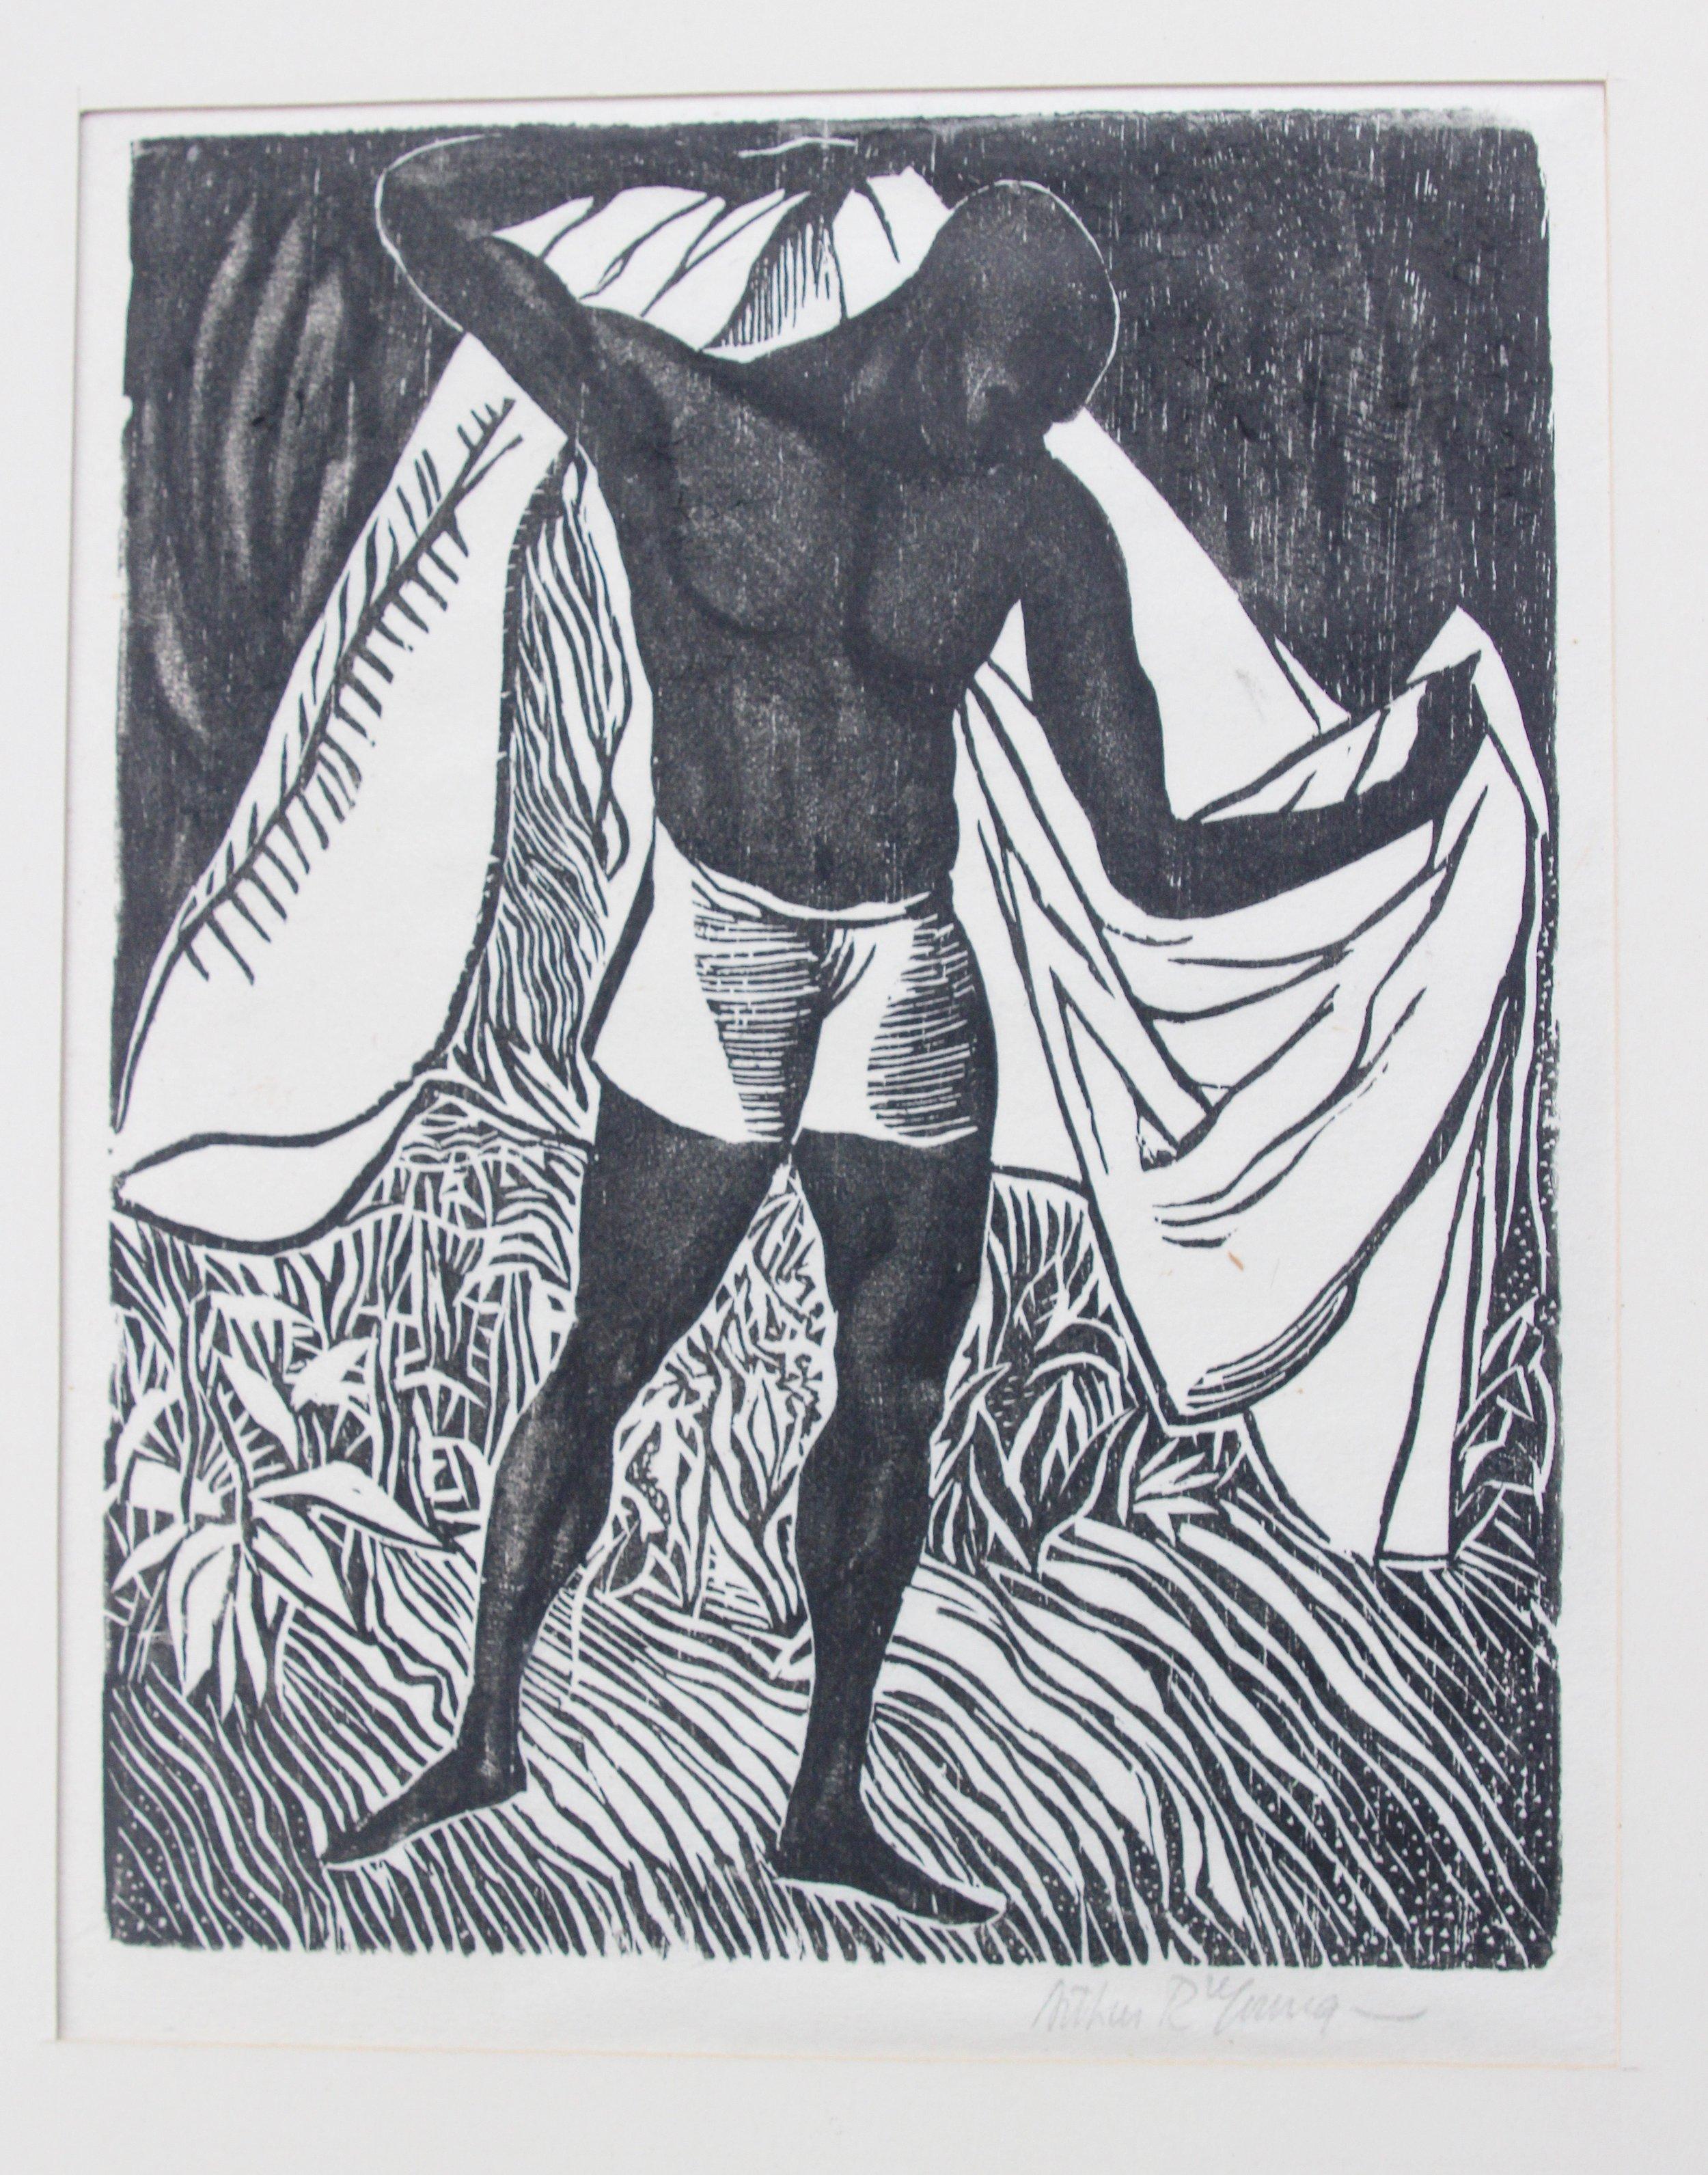 Arthur R. Young, Black Athlete, 1924